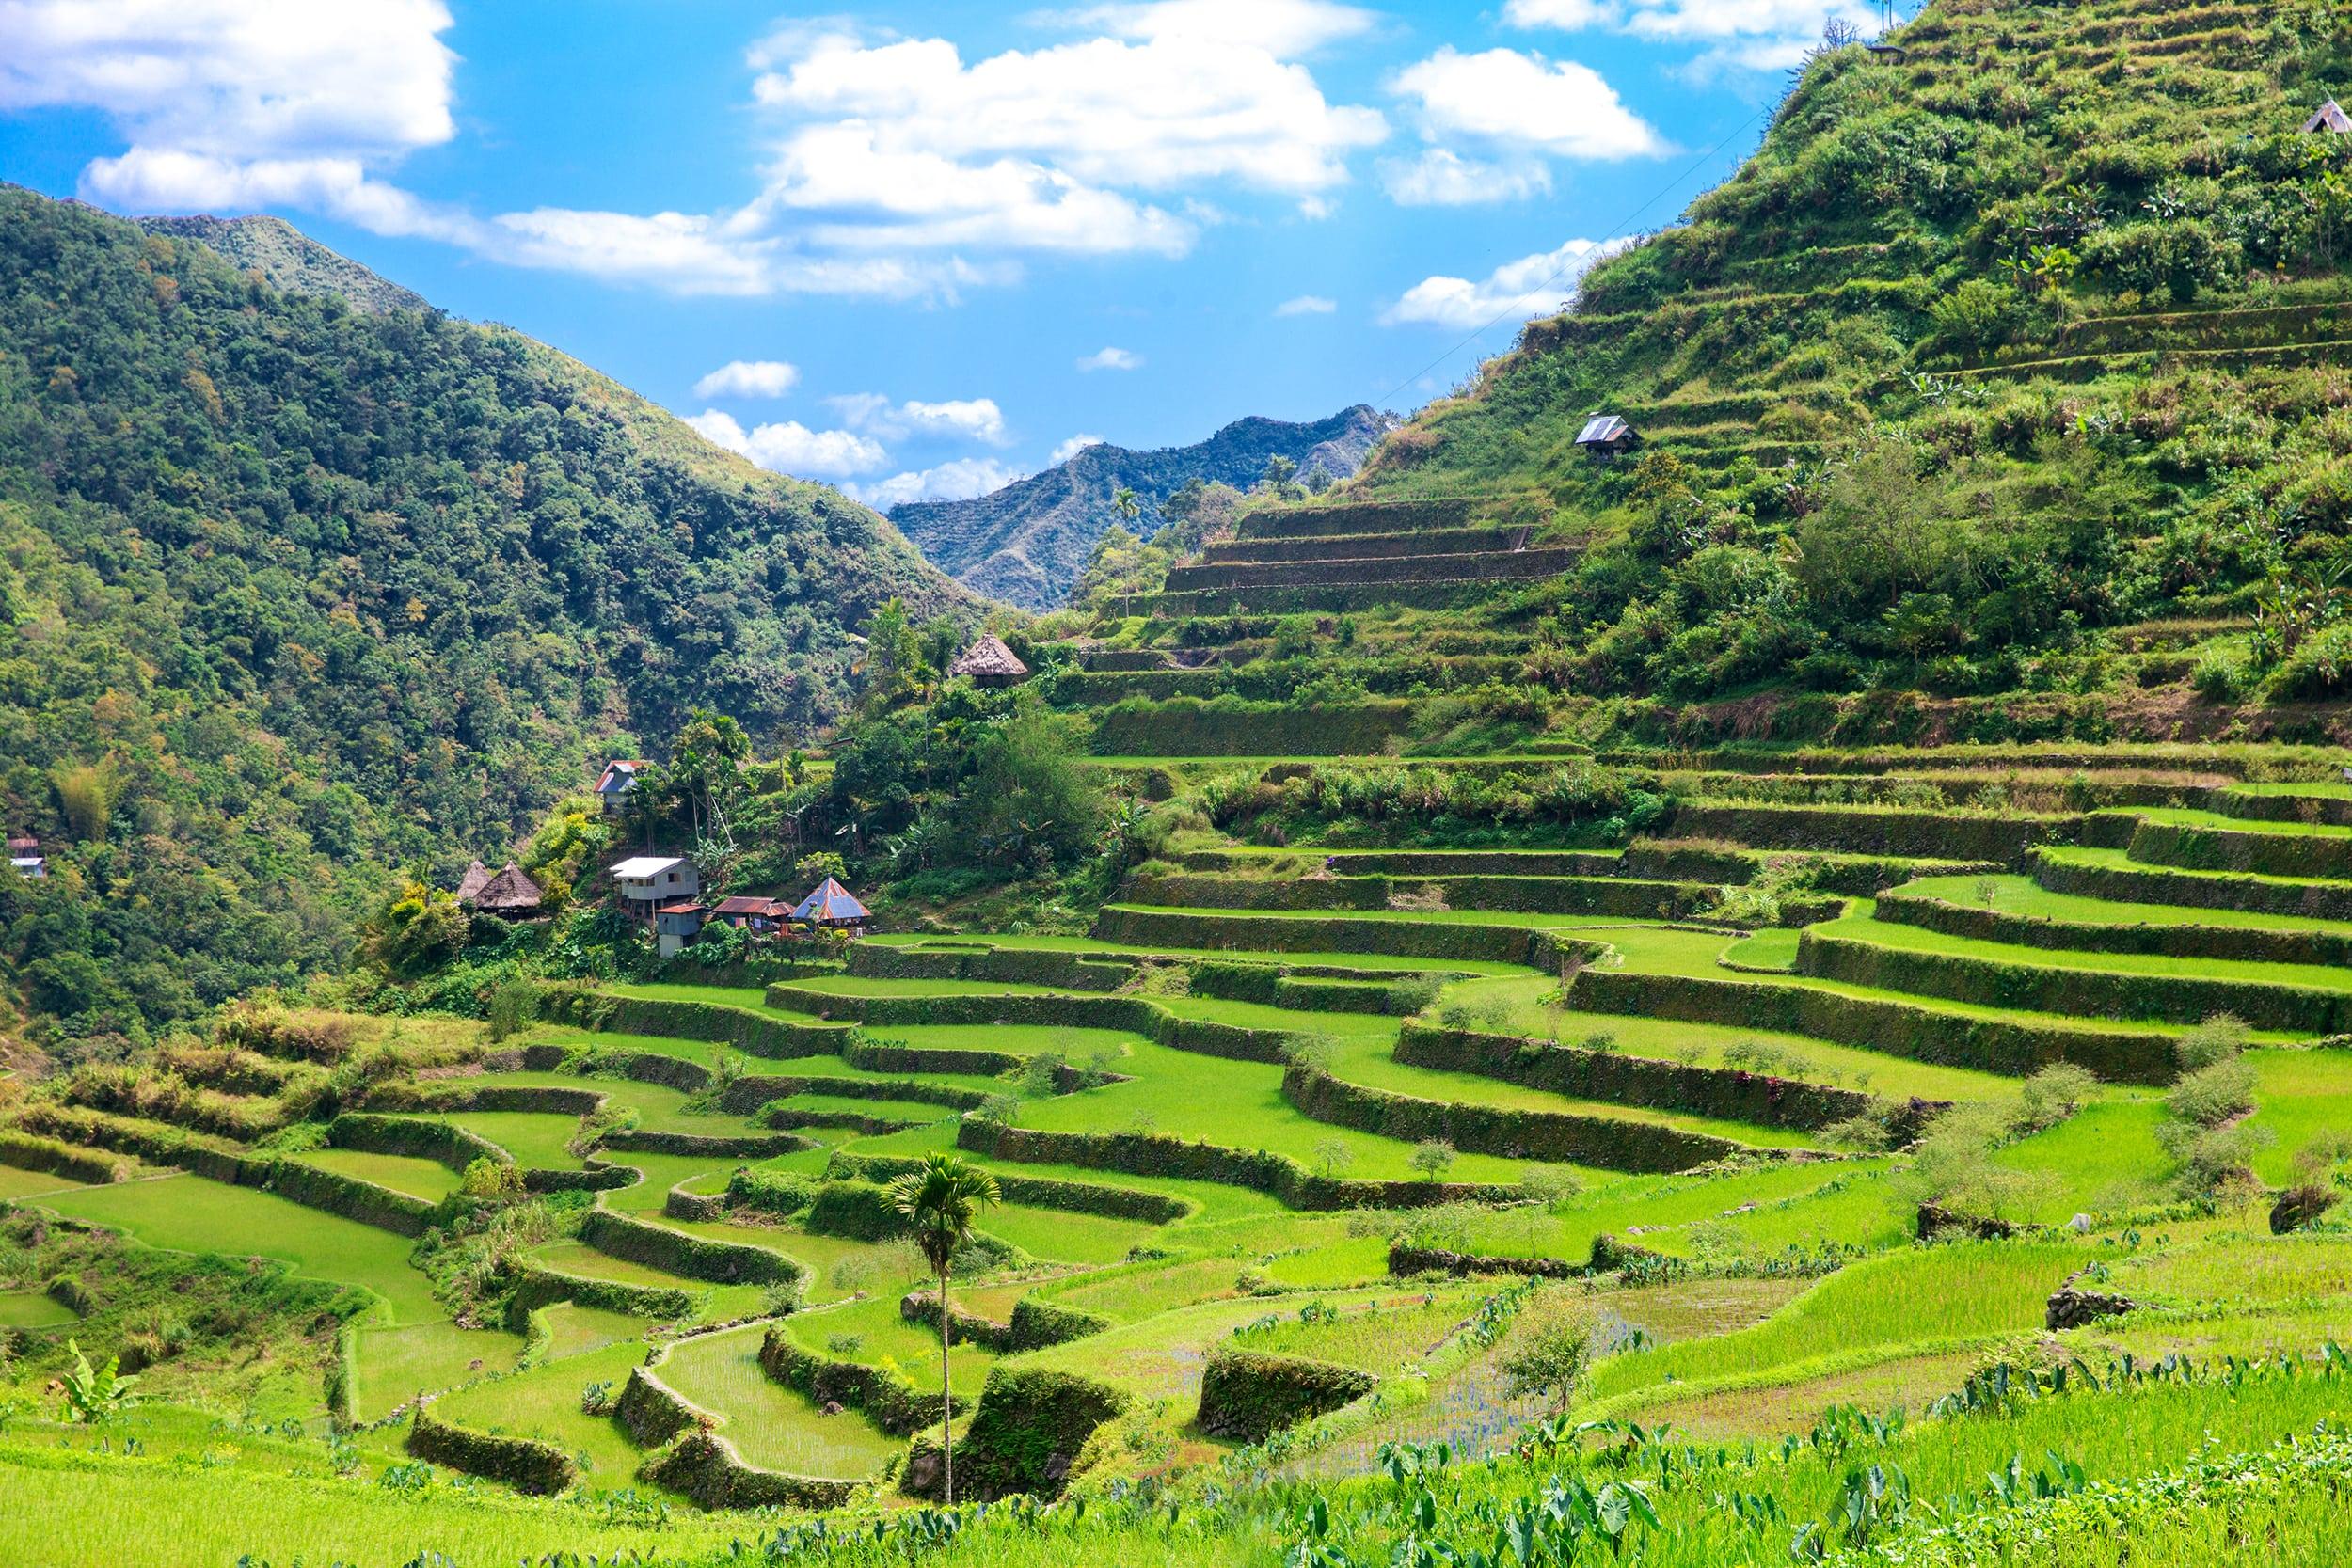 Beautiful view of Batad Rice terraces in Banaue